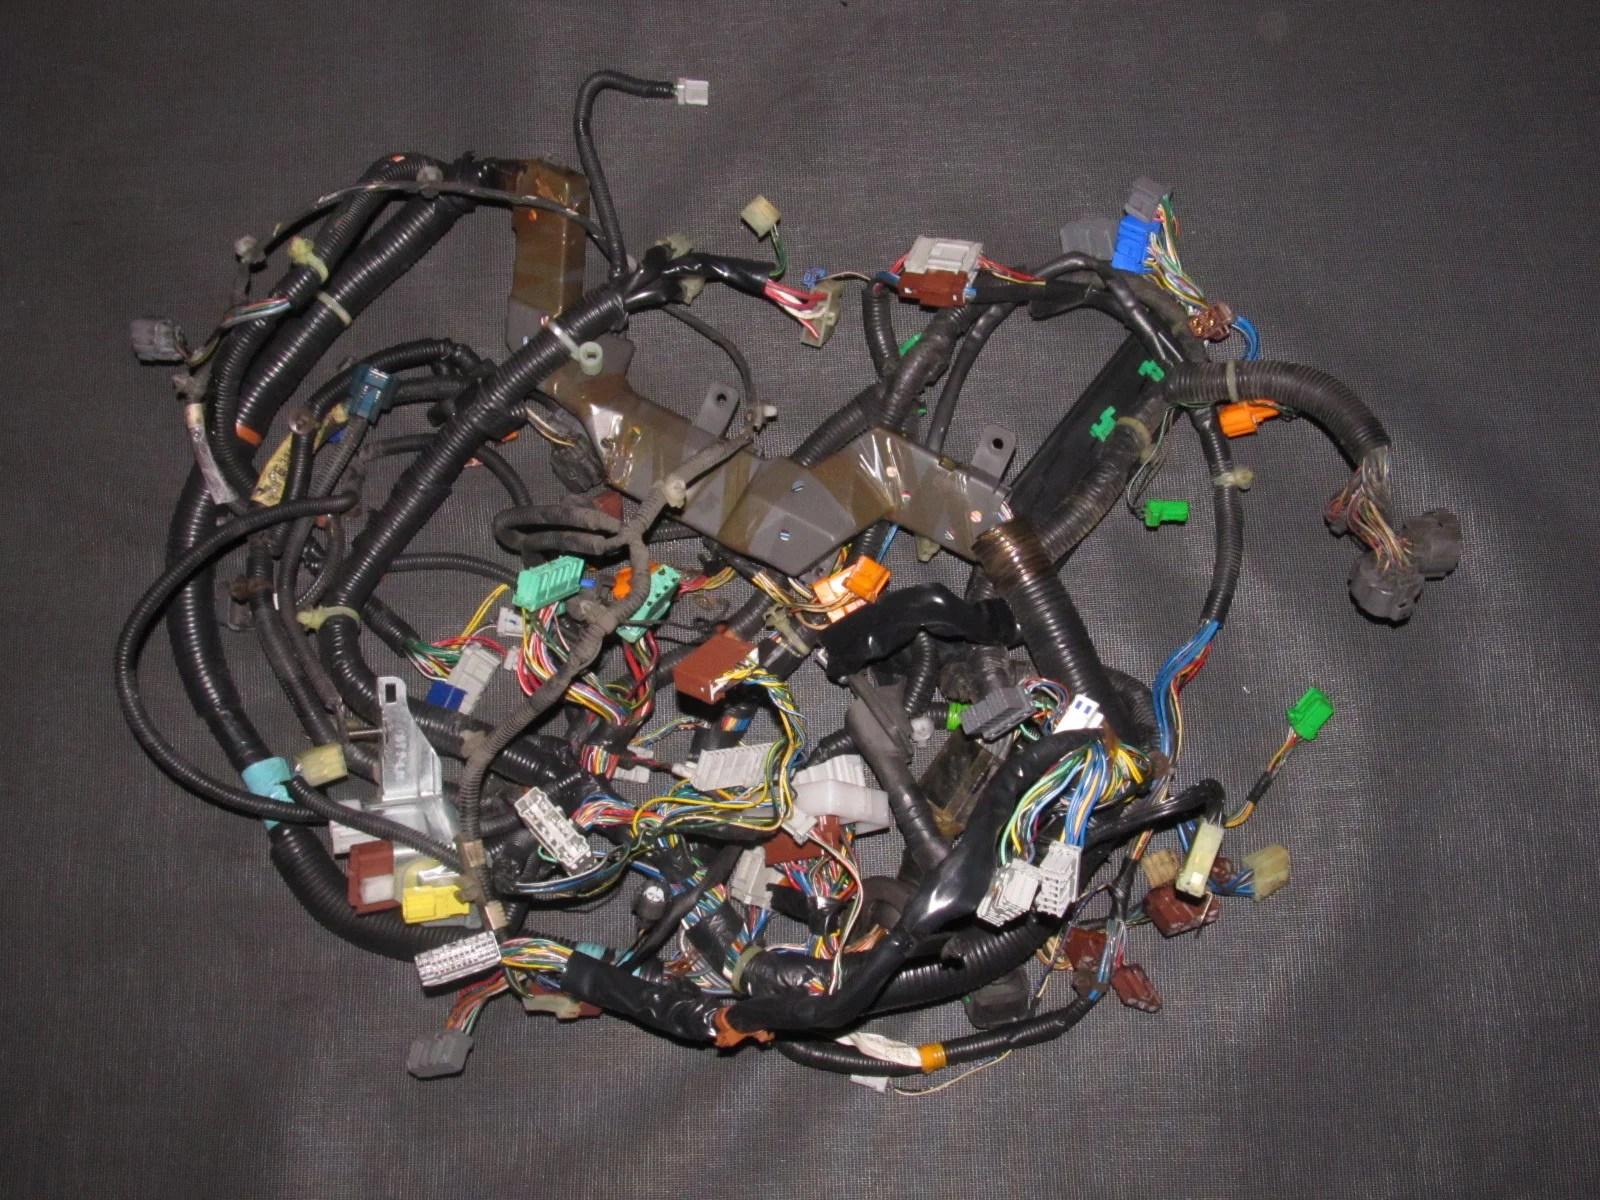 medium resolution of b18b1 wiring harness wiring diagrams b18b1 vtec 96 01 acura integra oem b18b1 headlight ecu fuse